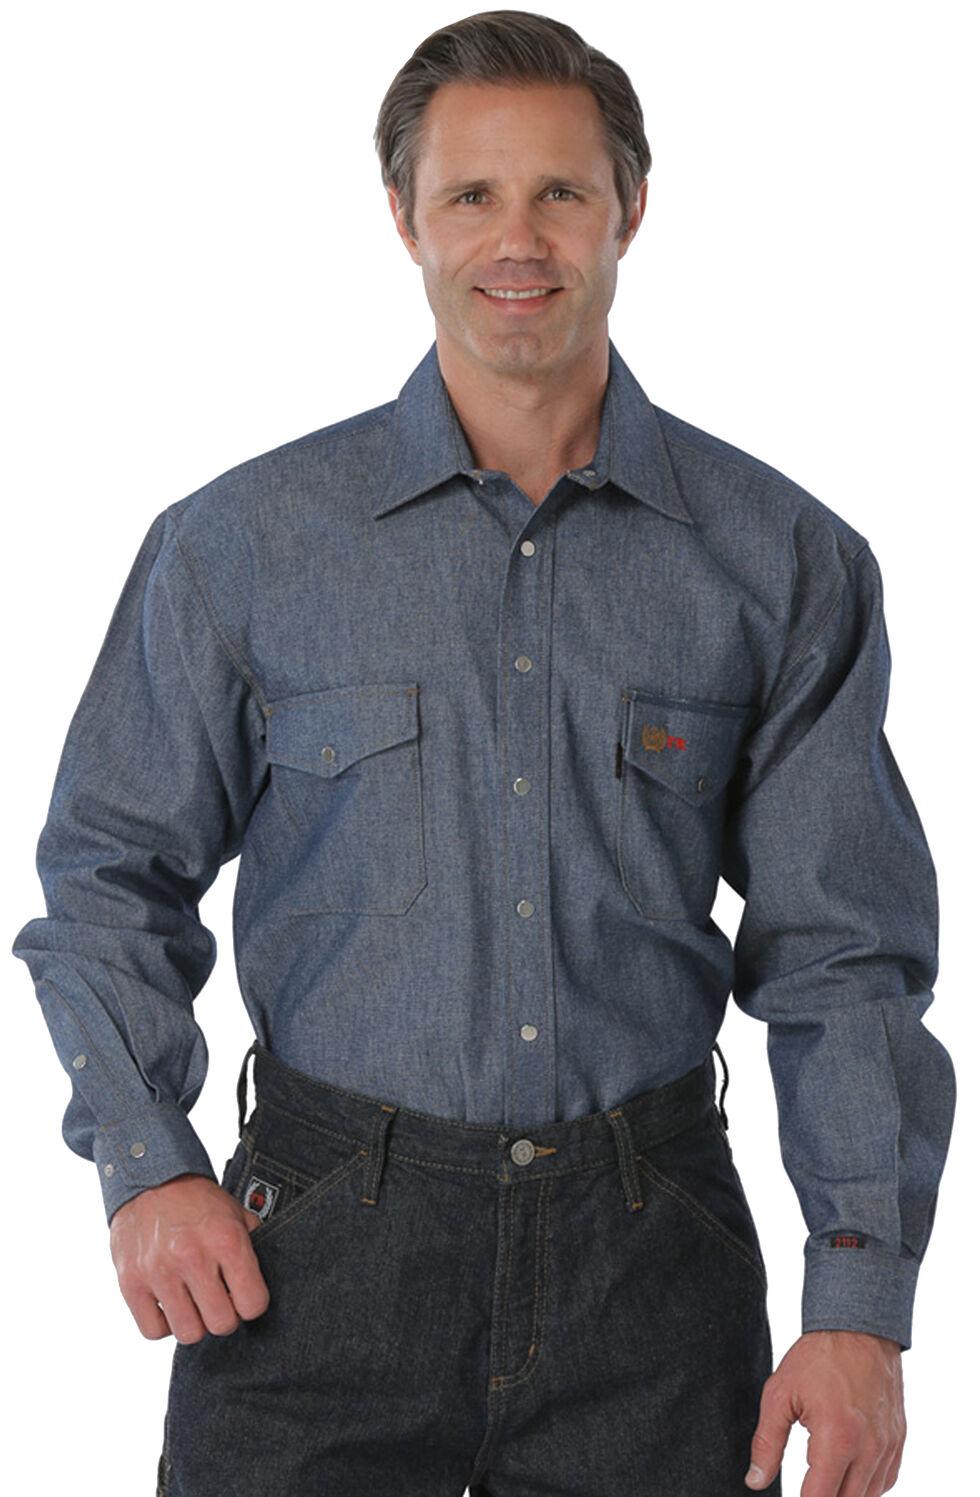 Cinch WRX Flame-Resistant Denim Work Shirt, Denim, hi-res